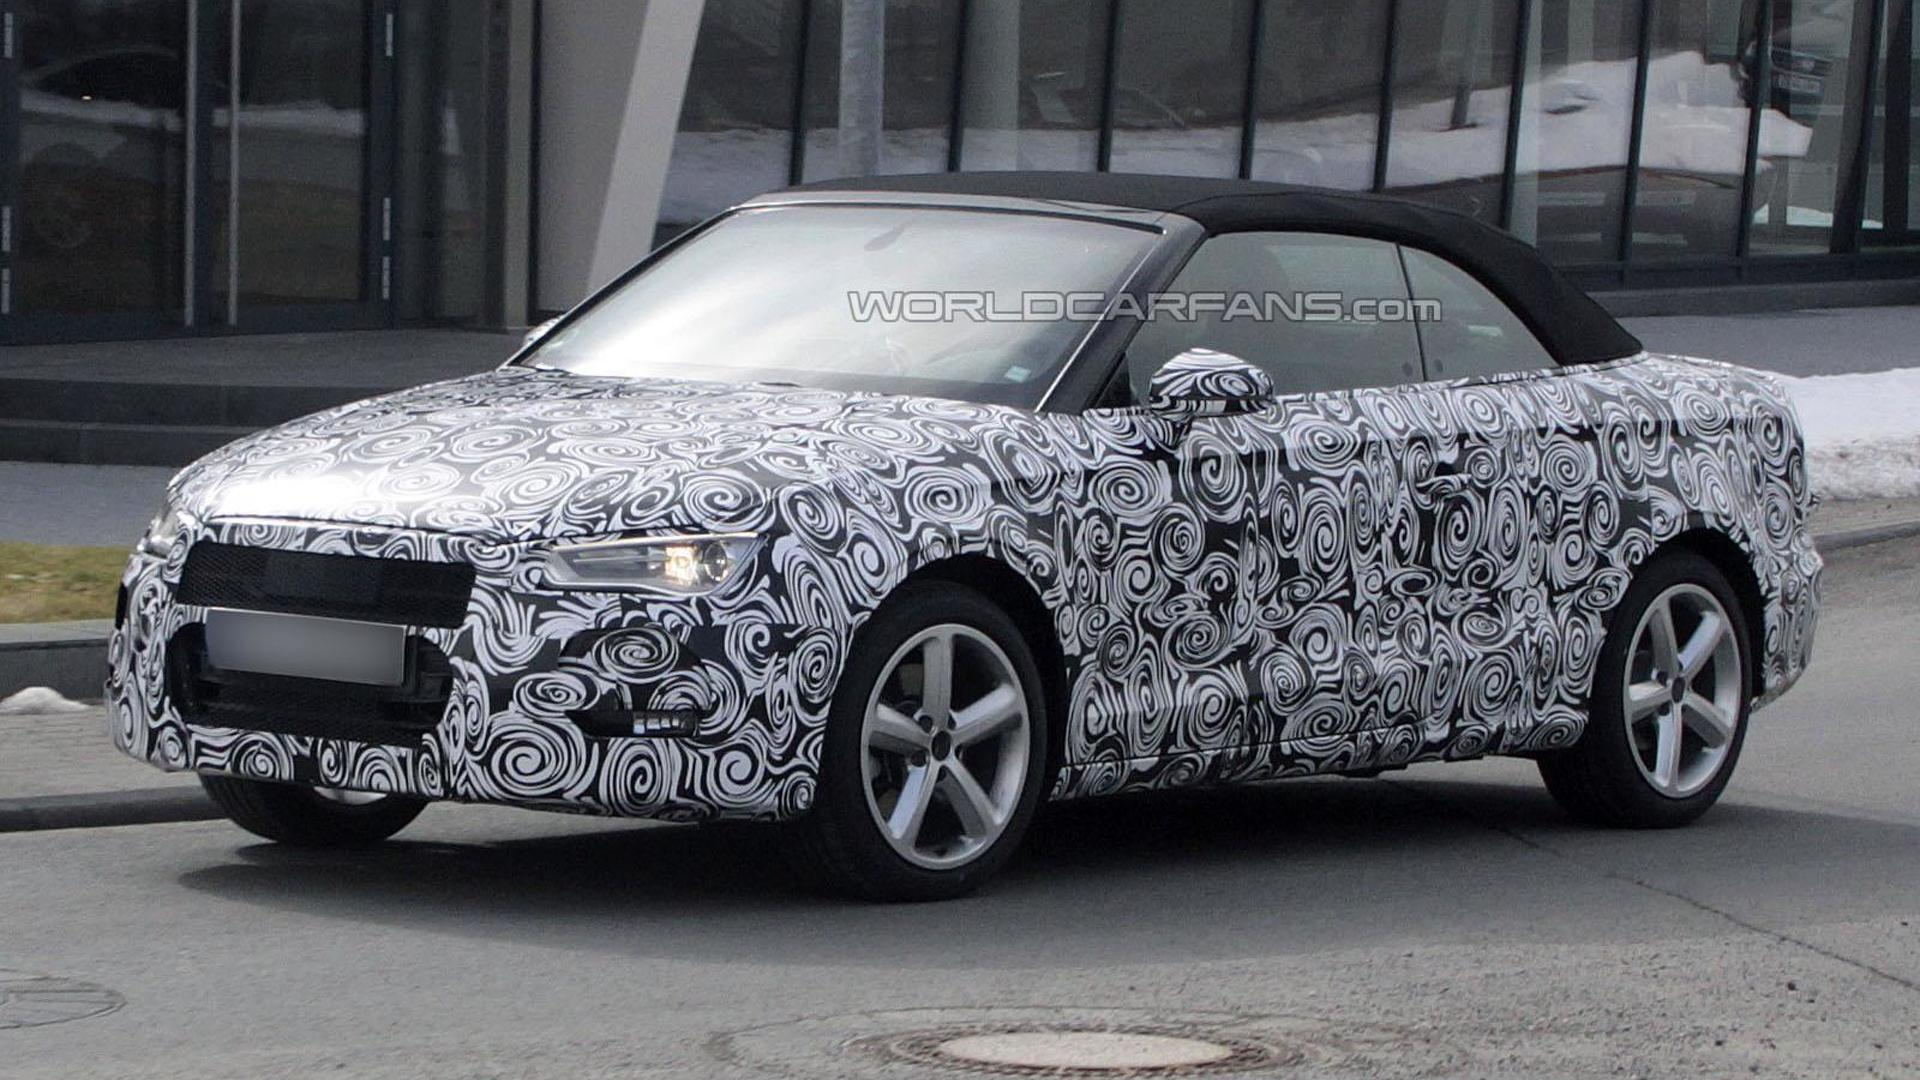 2014 Audi A3 Cabrio confirmed for Frankfurt Motor Show in September